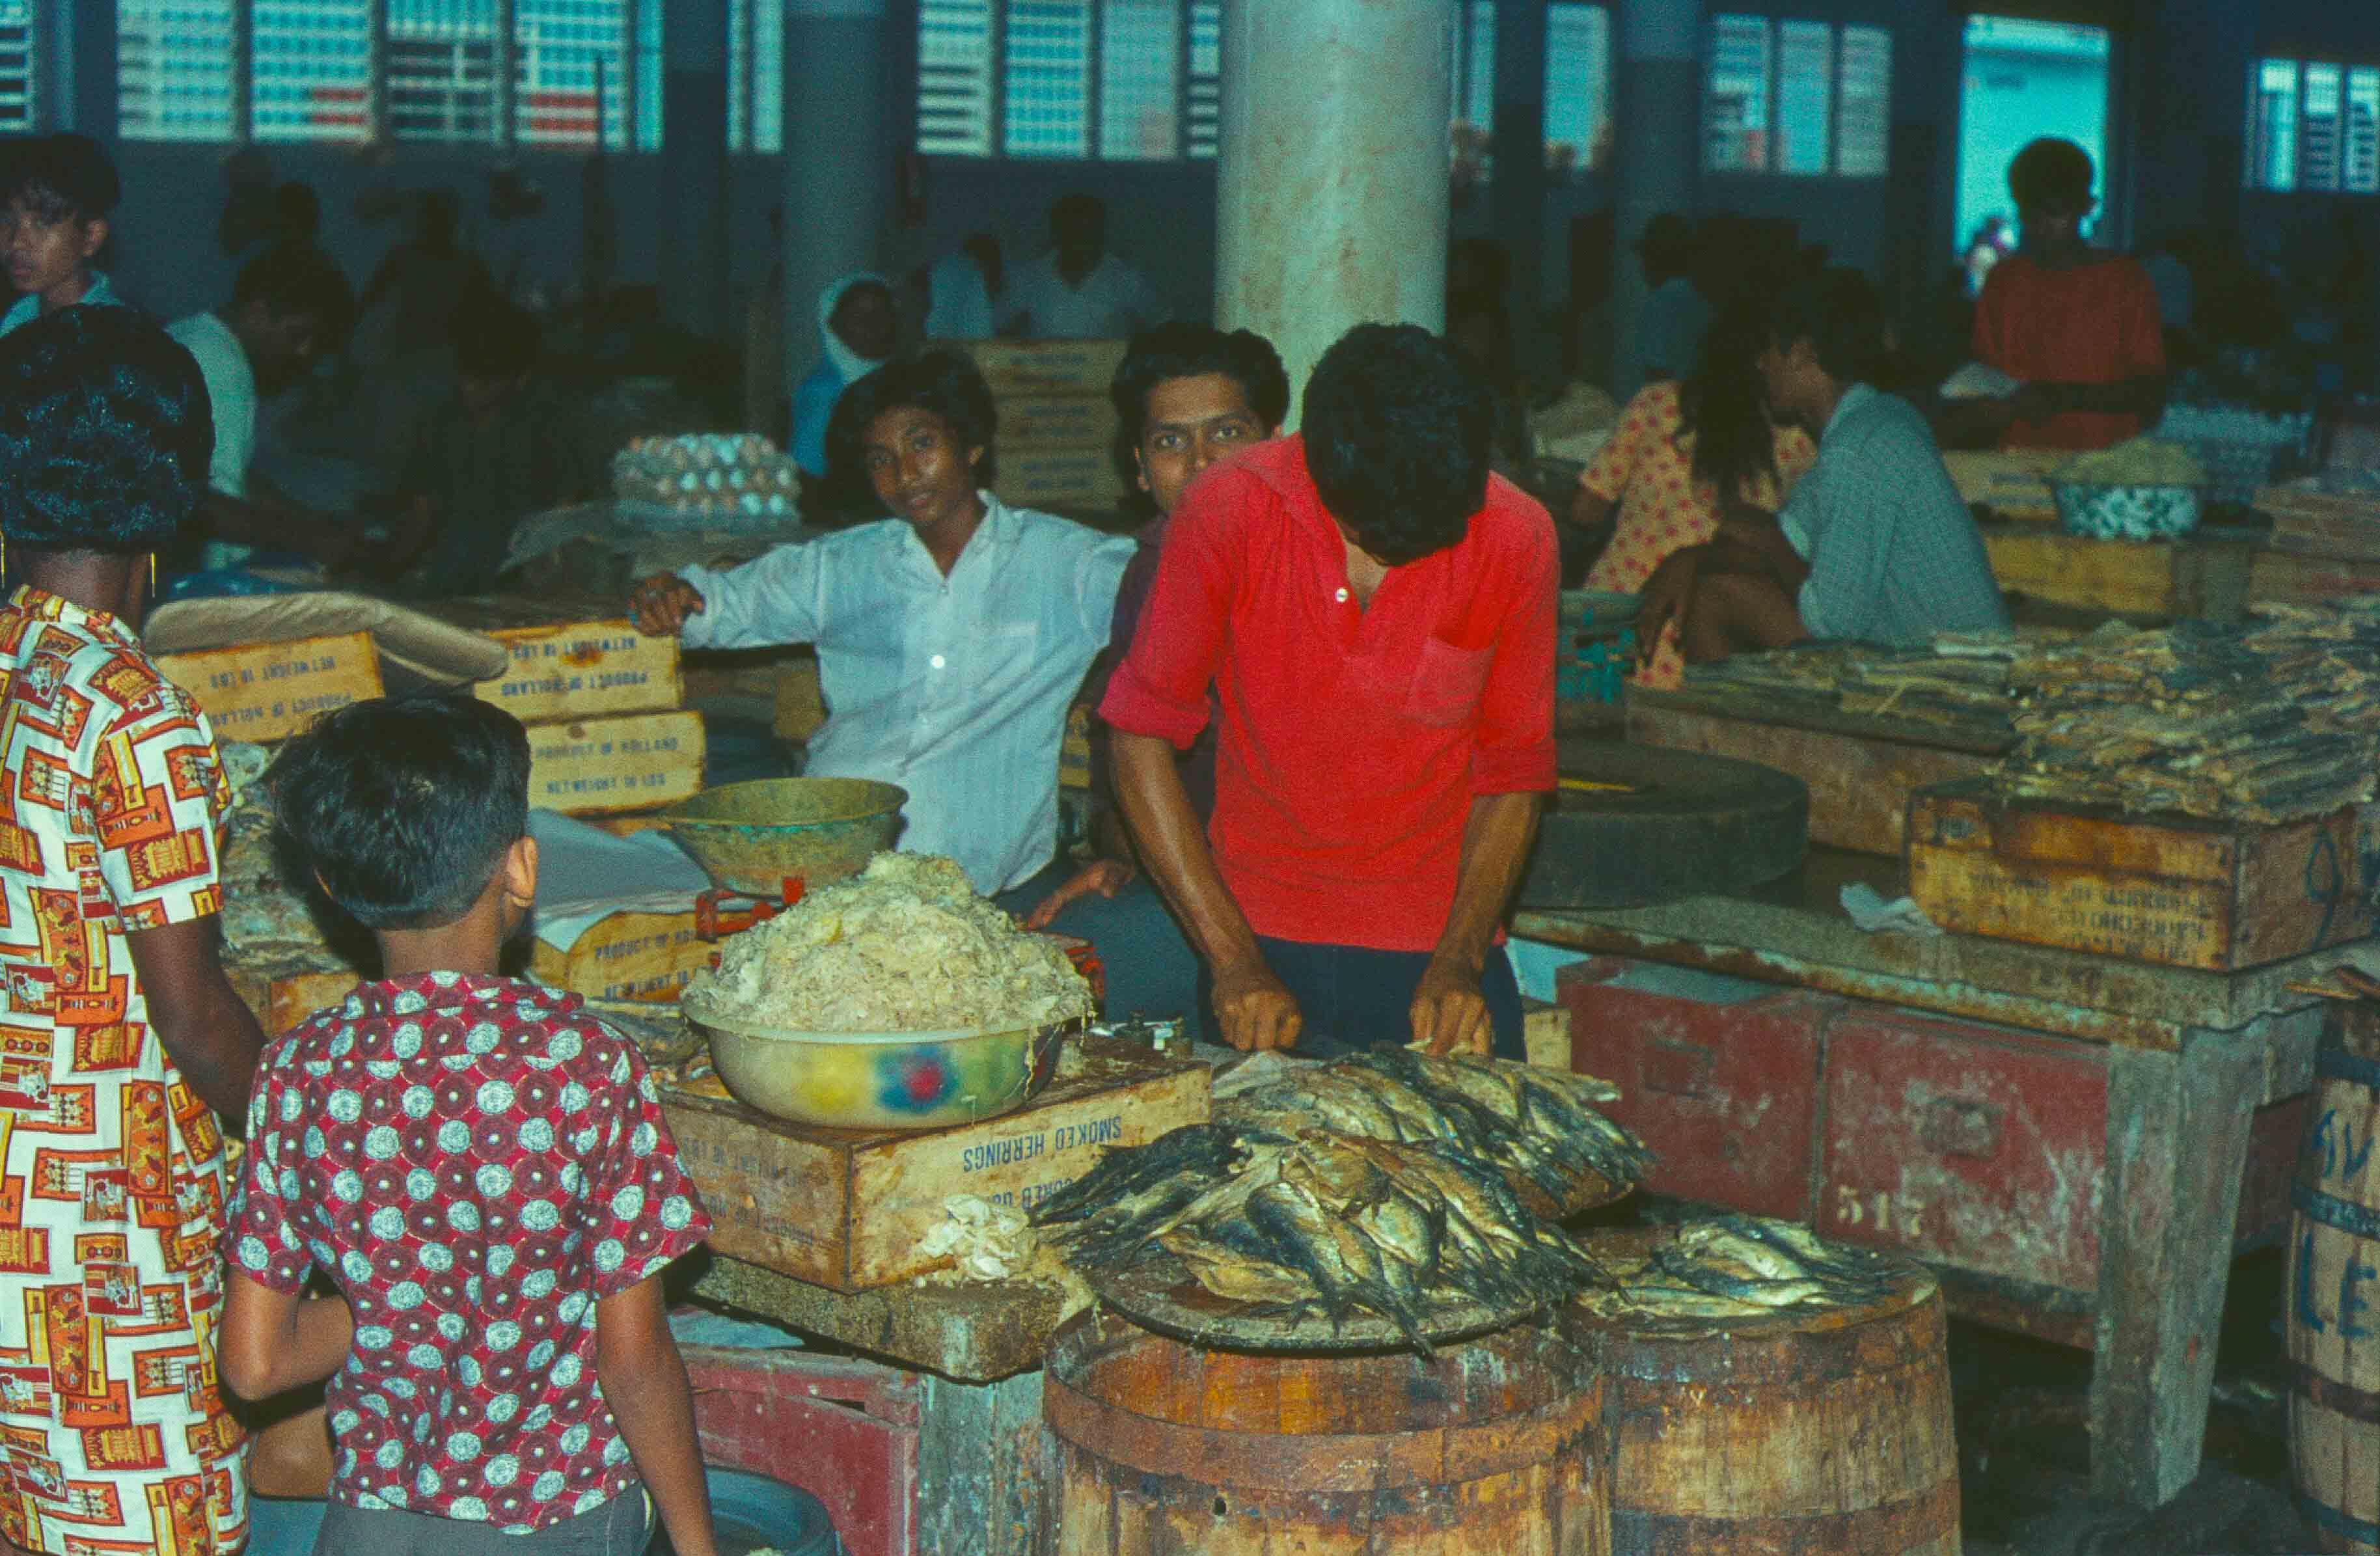 269. Suriname